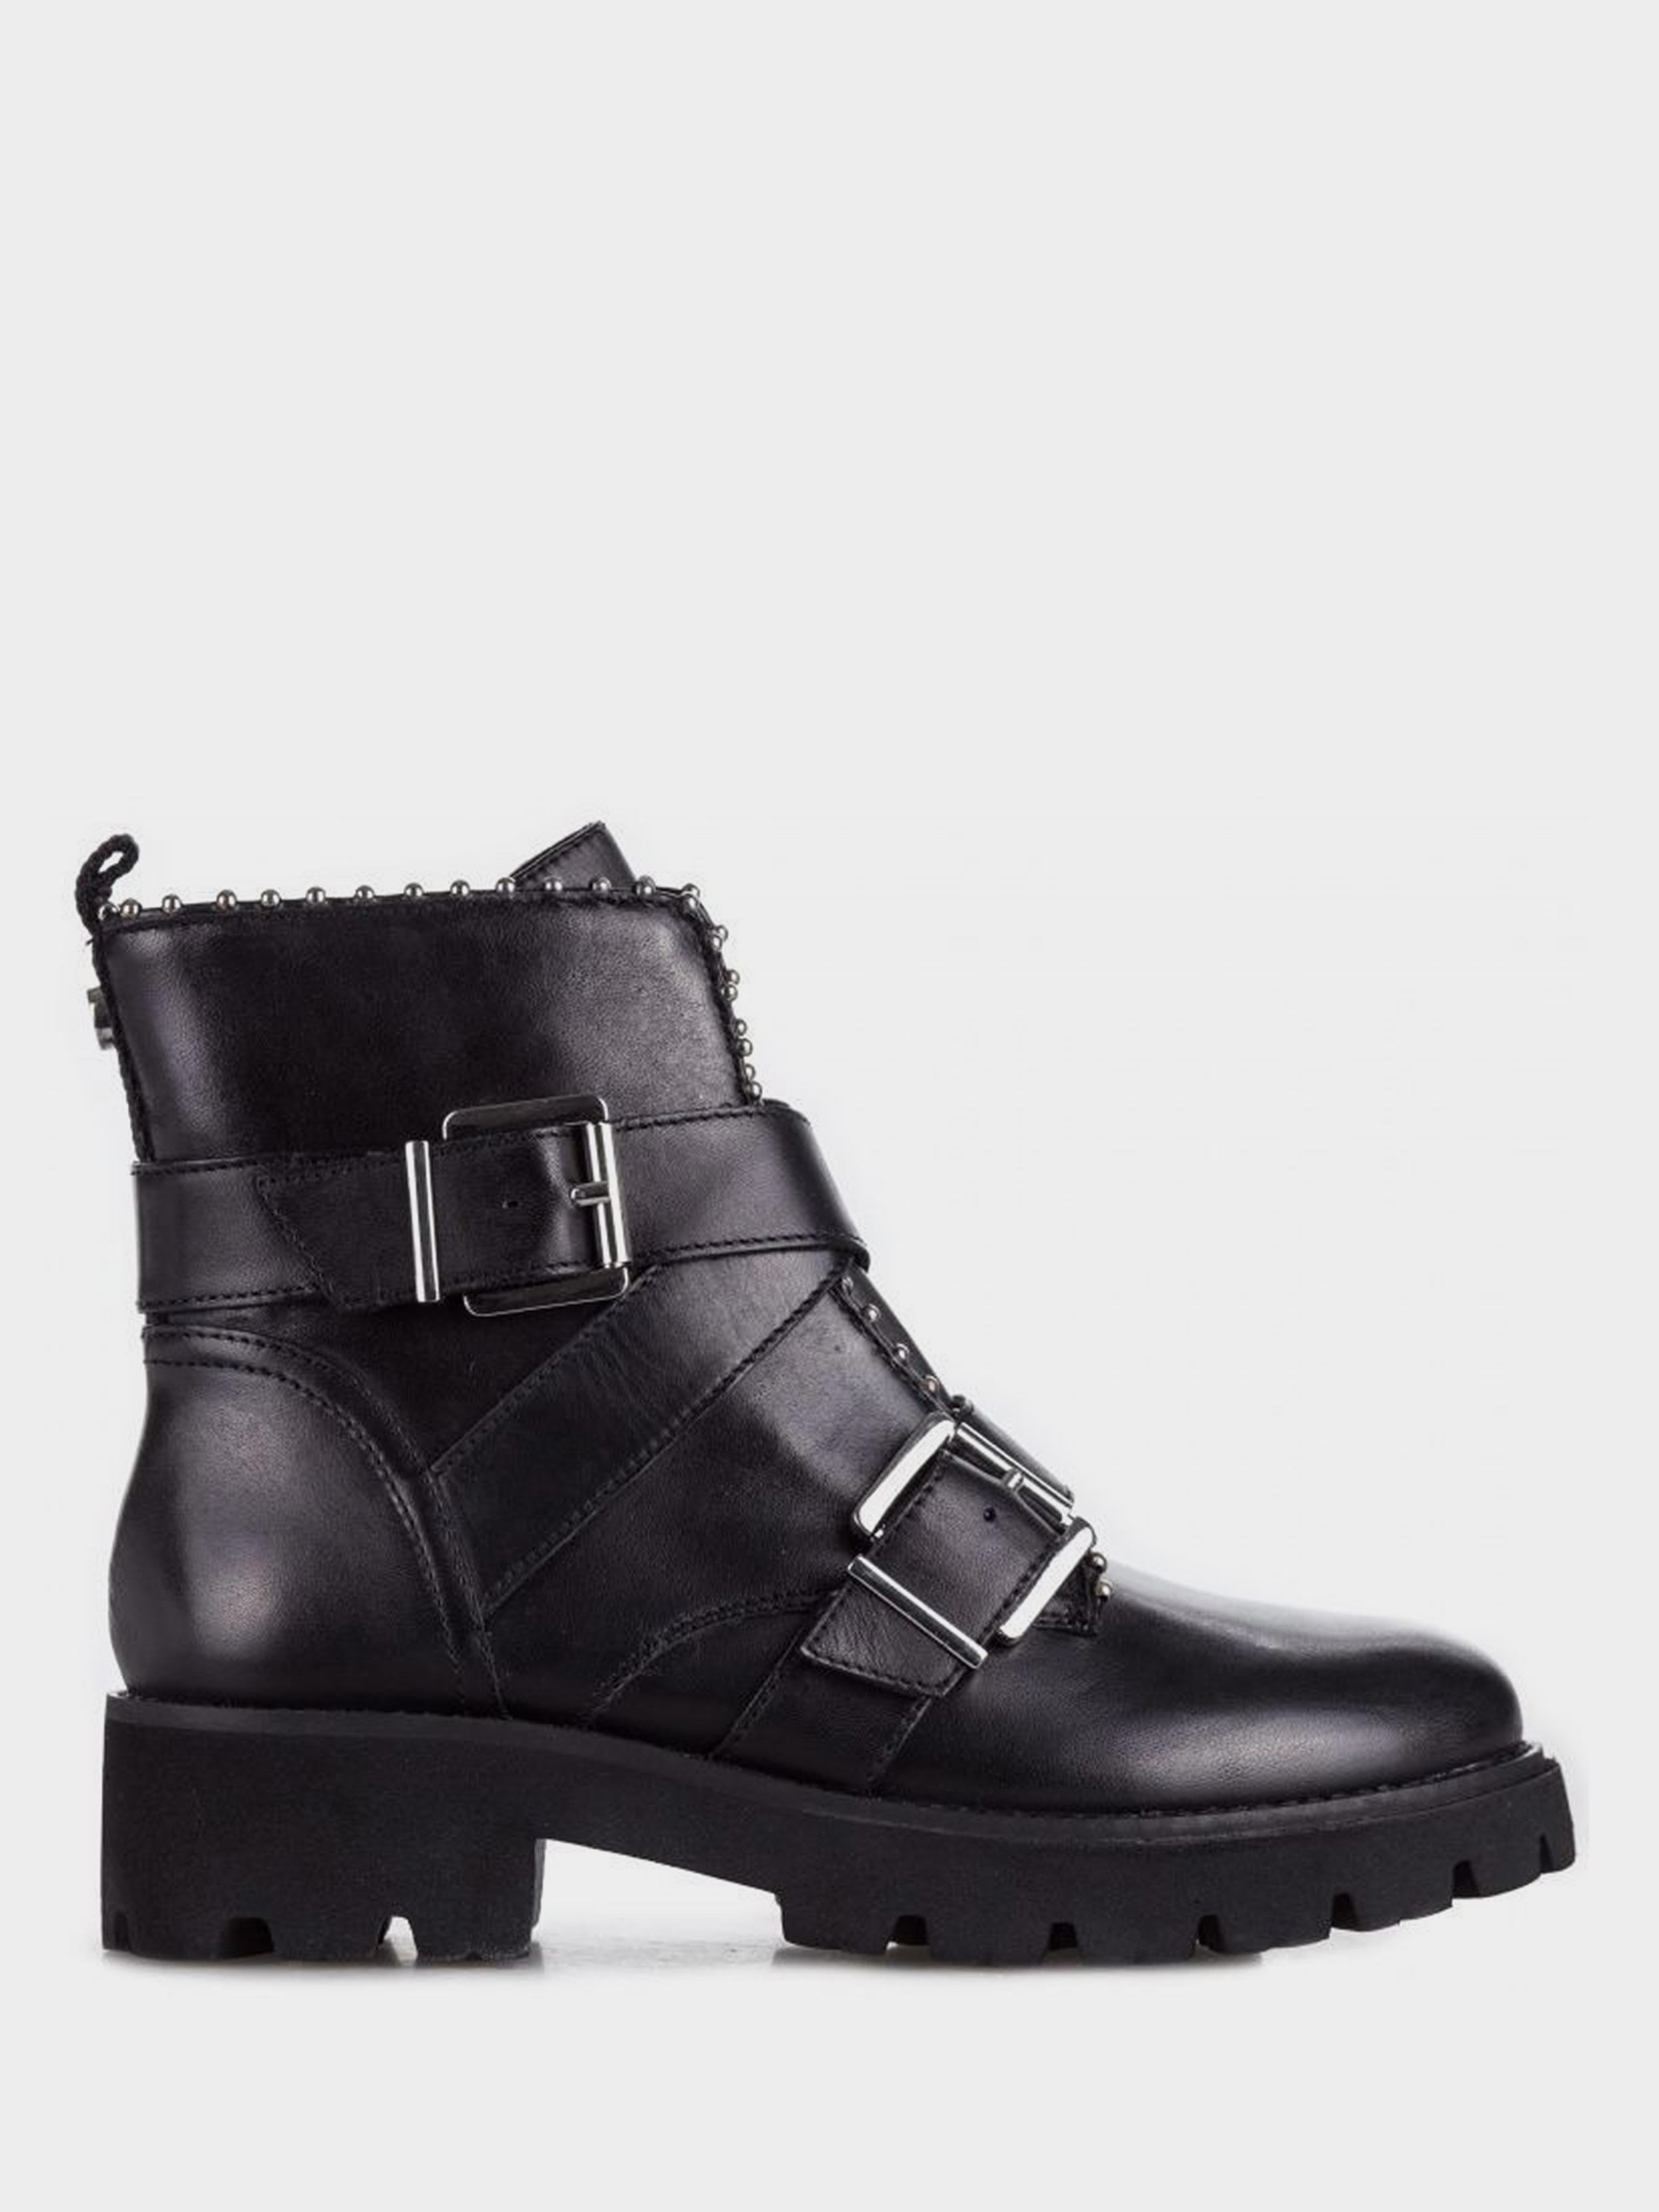 58a126ed1e7e Ботинки женские Steve Madden модель 9T46 - купить по лучшей цене в ...